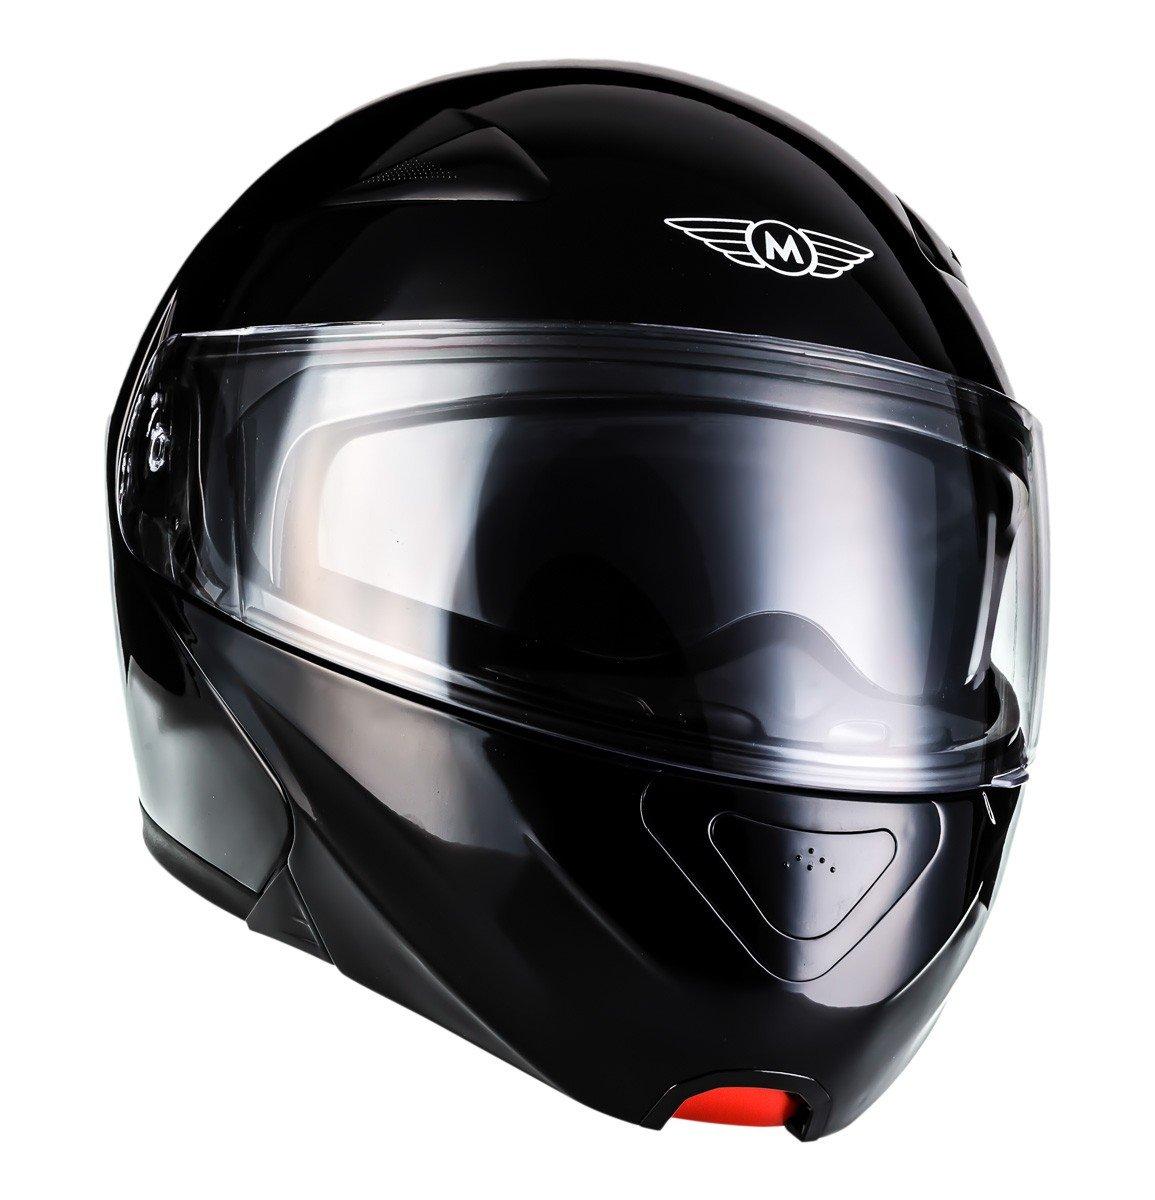 two Visors /· incl 53 Cloth Bag /· Black /· XS MOTO F19 Gloss Black /· Cruiser Scooter-Helmet Scooter-Helmet Flip-Up Helmet Motorcycle-Helmet Modular-Helmet Street Moto-Helmet Full-Face Helmet /· ECE certified /· incl